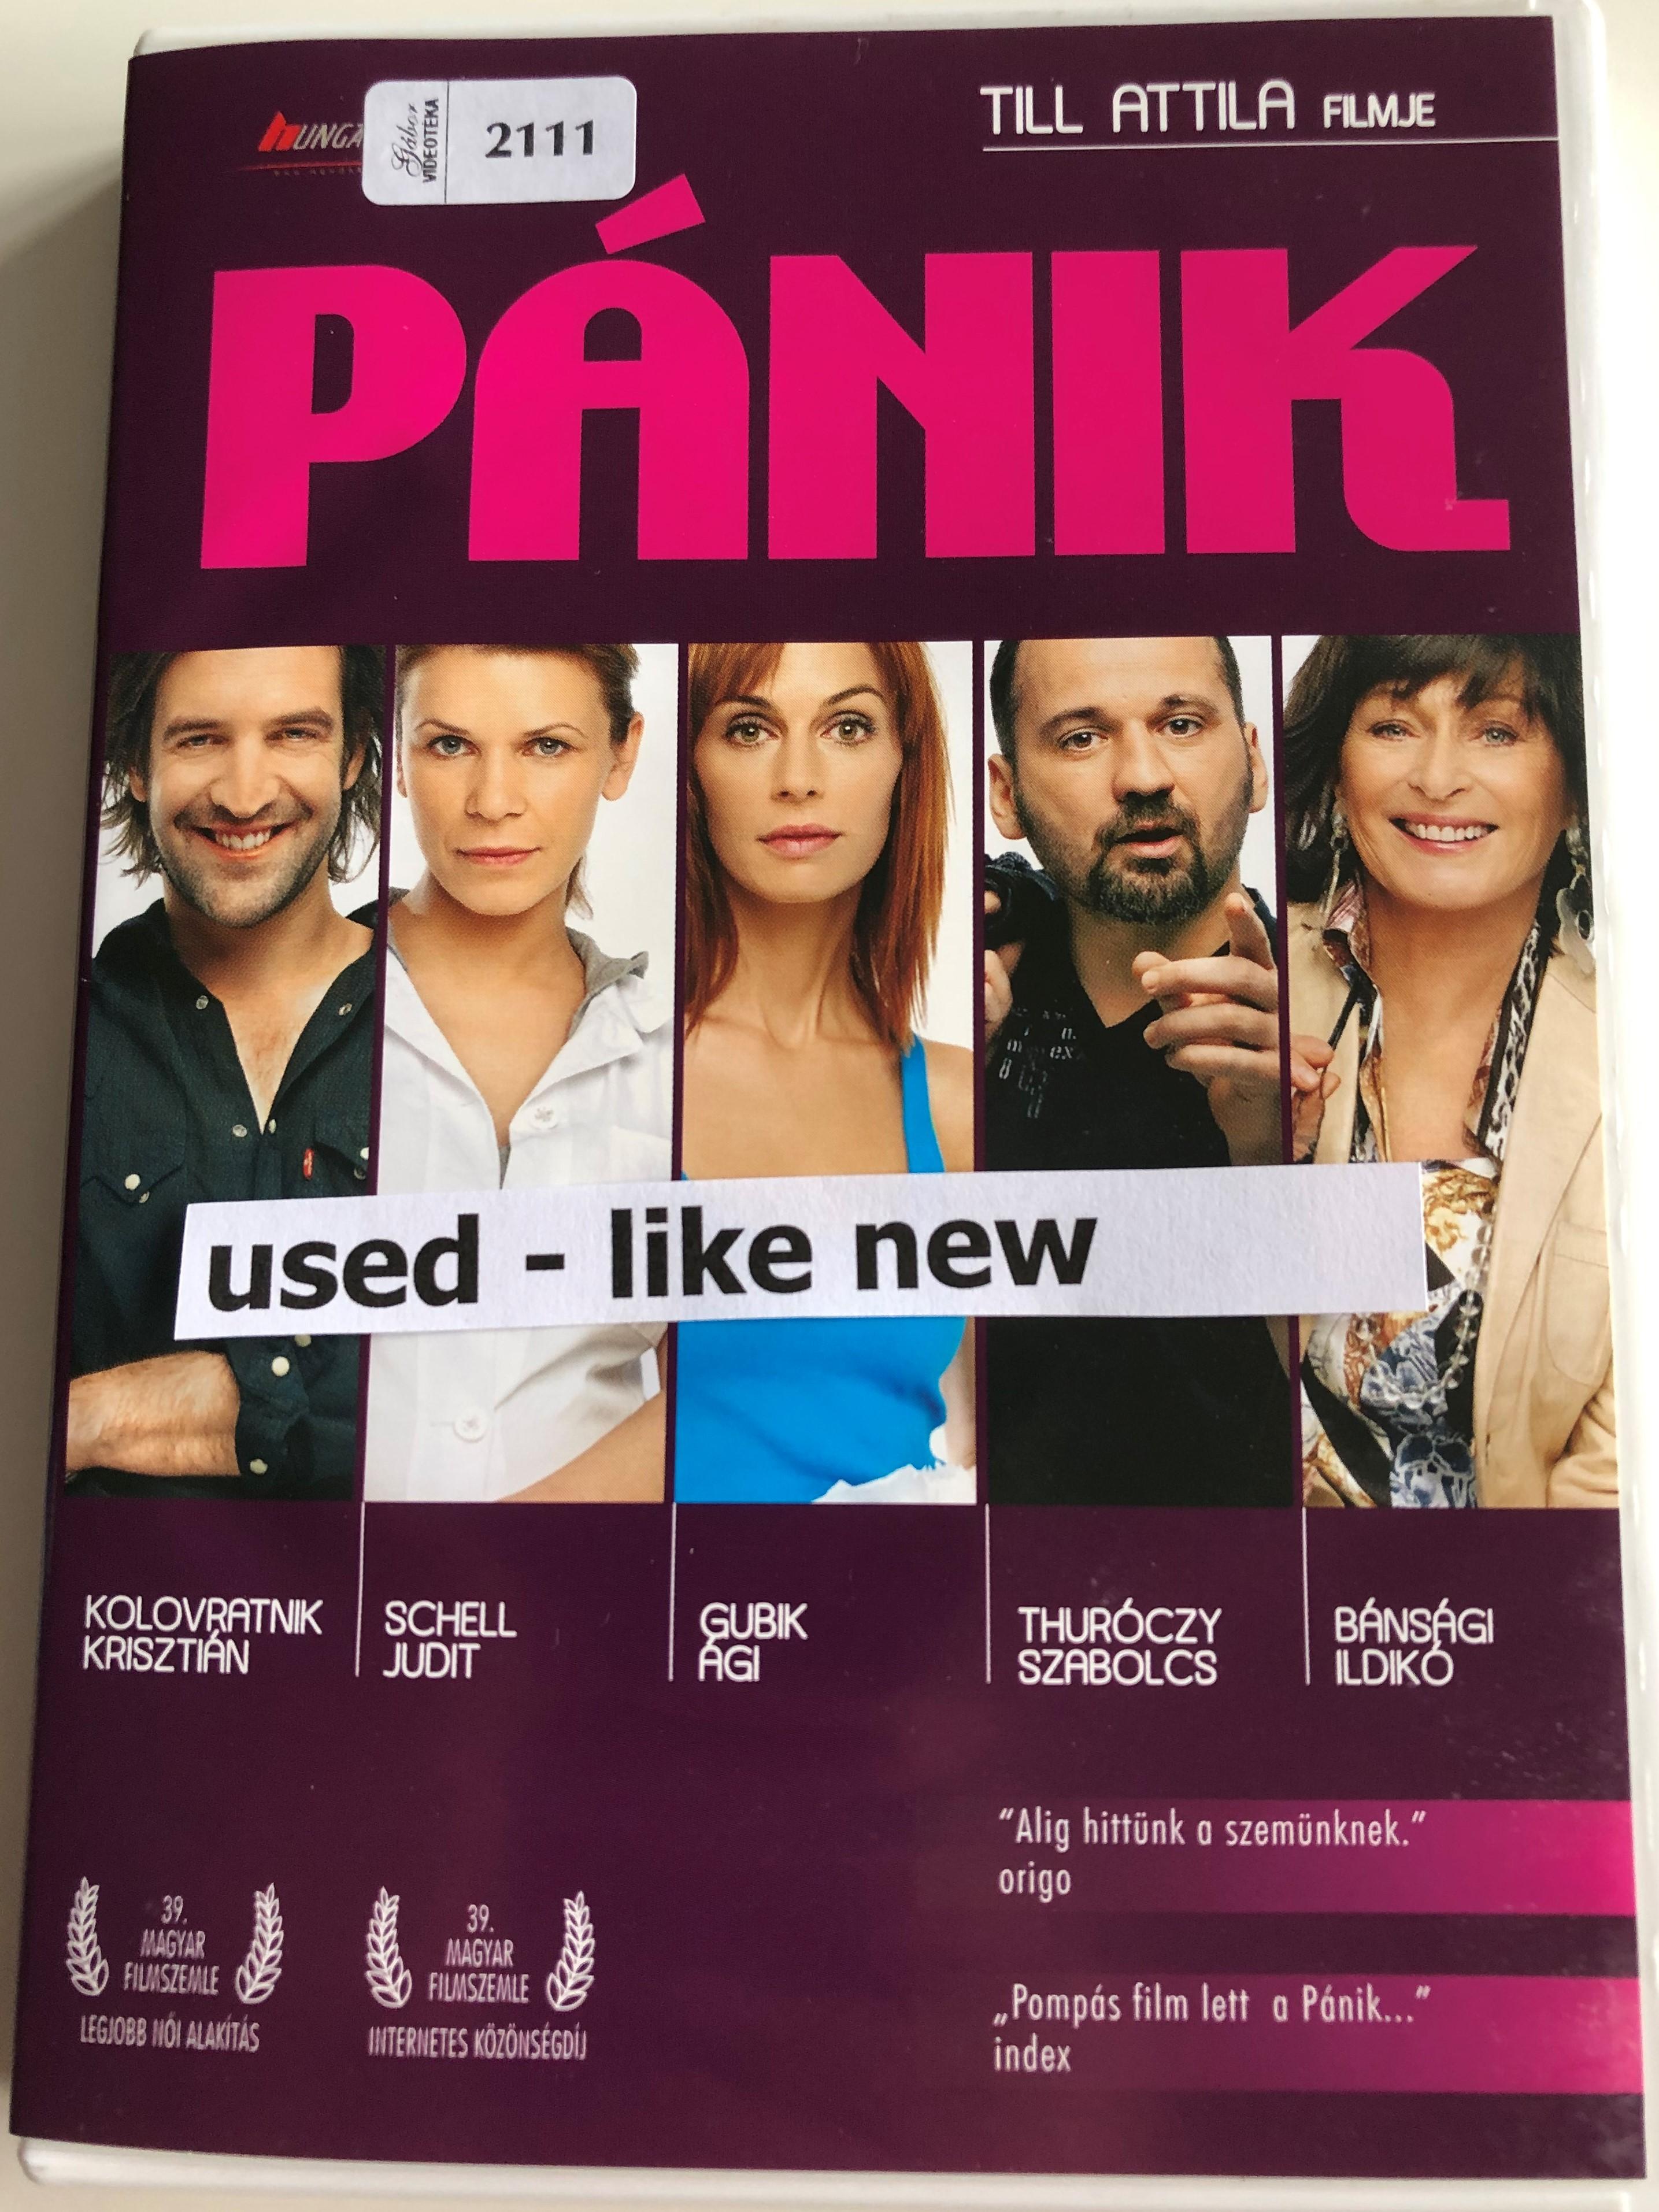 p-nik-dvd-2008-panic-directed-by-till-attila-4.jpg